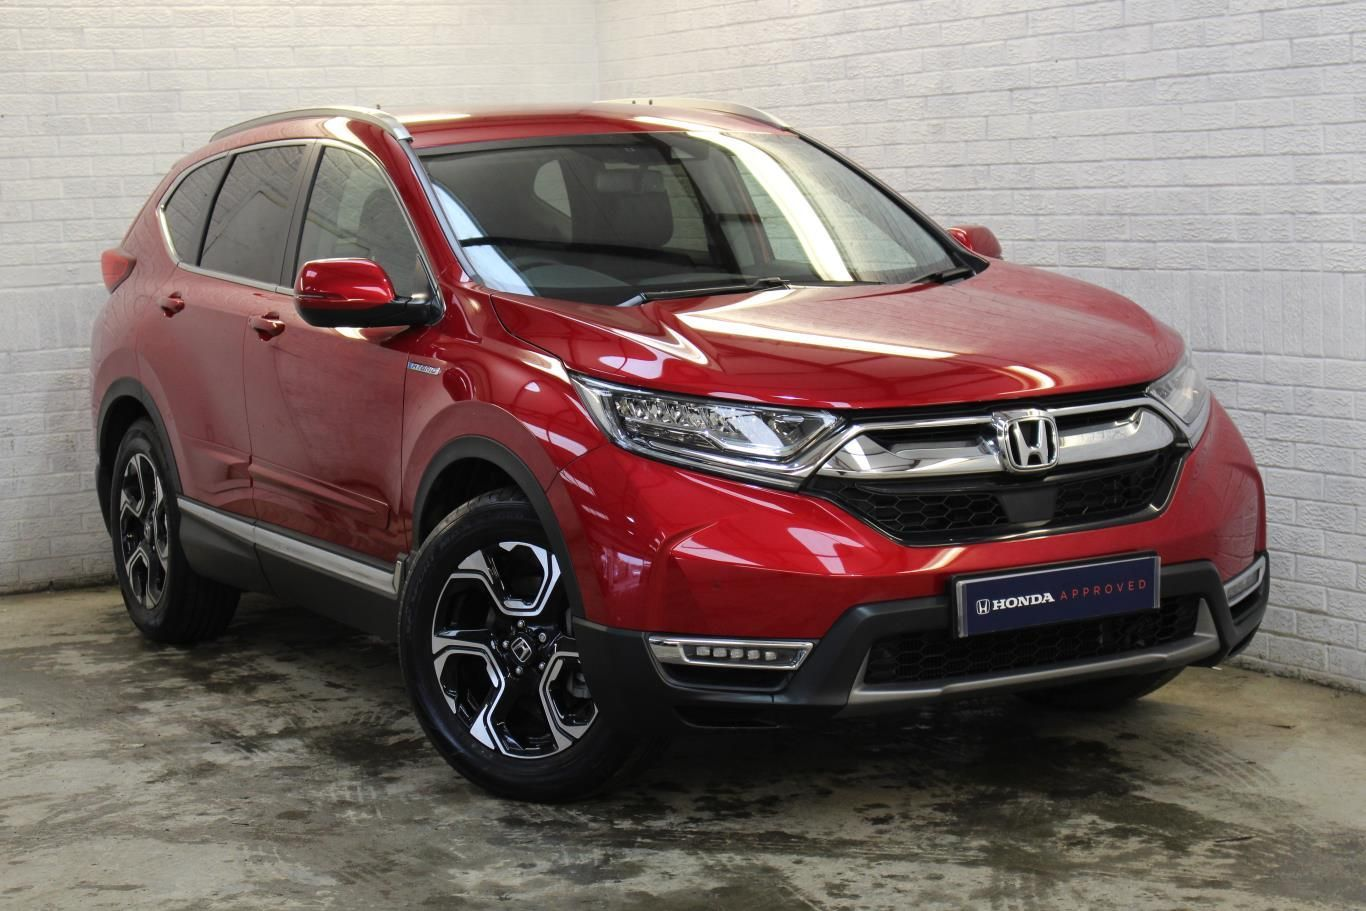 Honda CR-V 2.0 i-MMD Hybrid SR 2WD